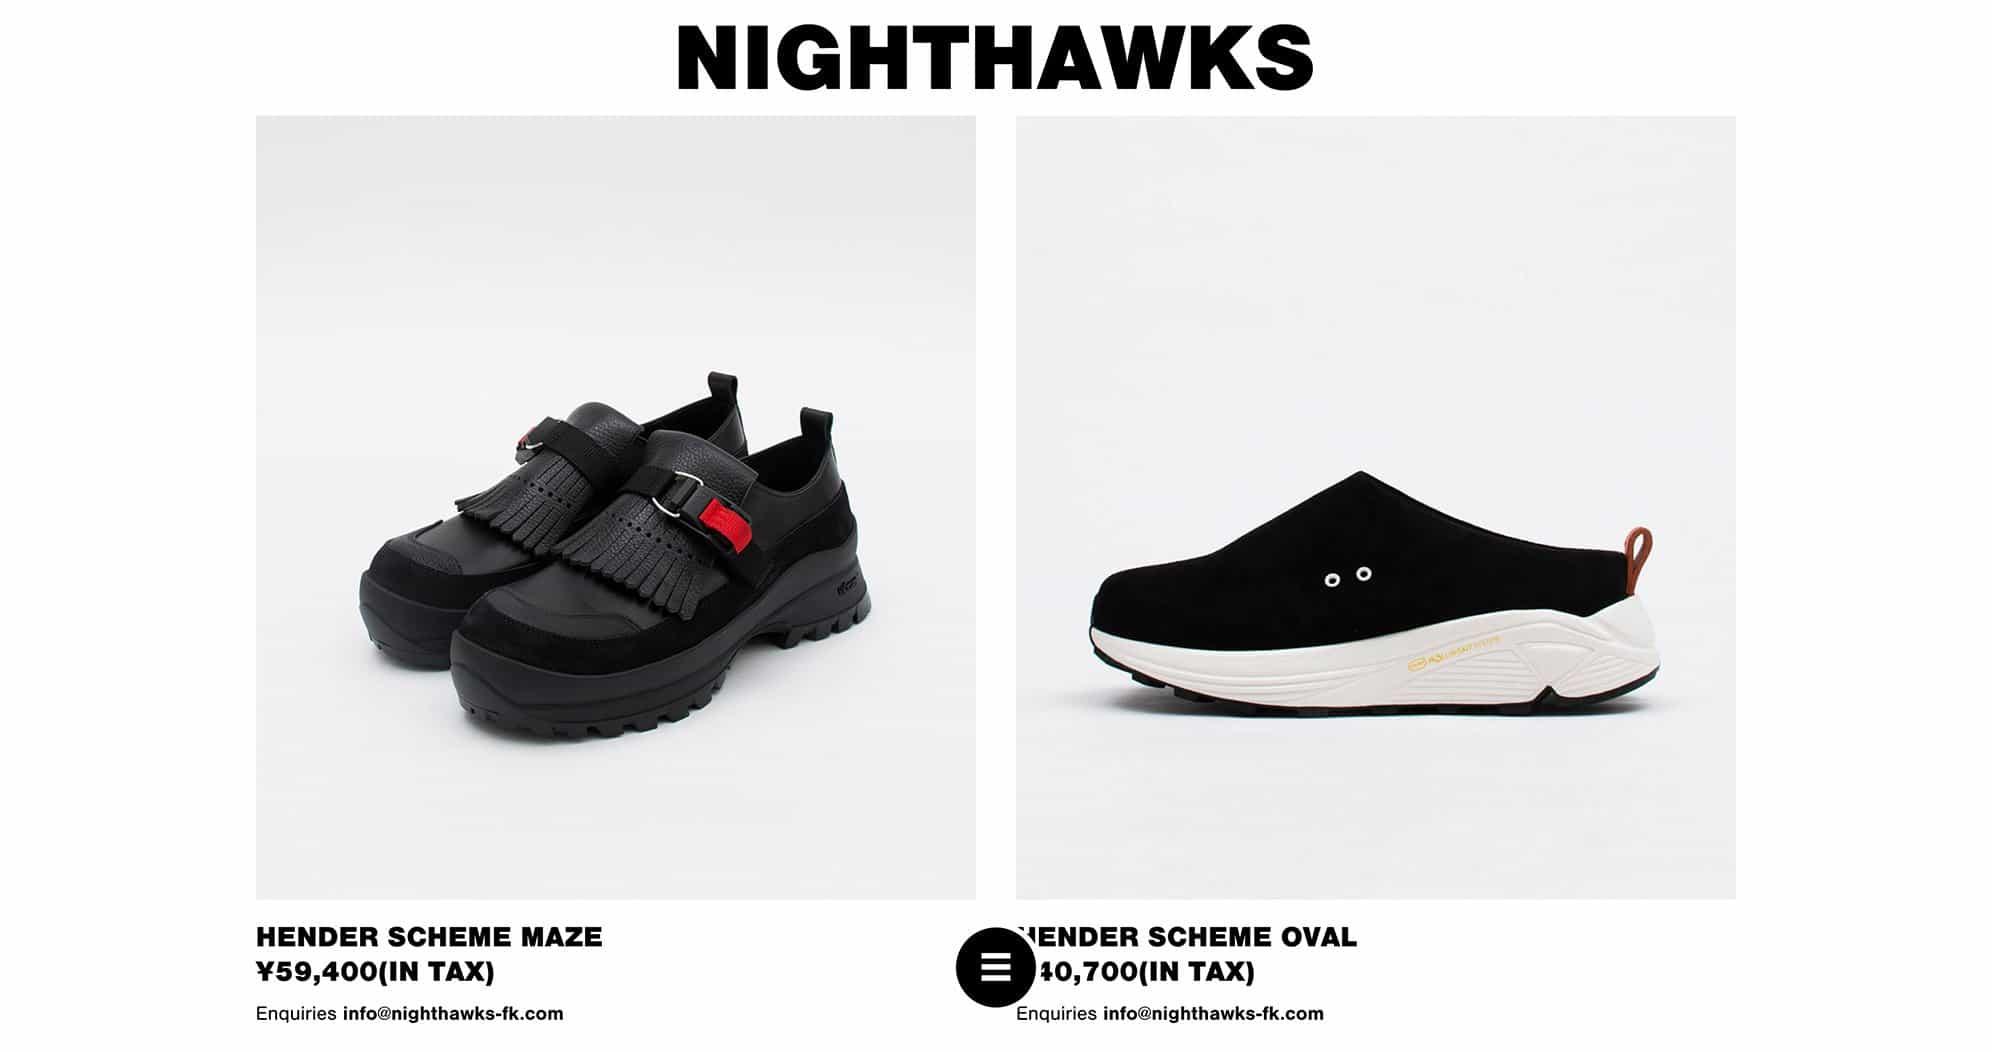 nighthawks-brand-page